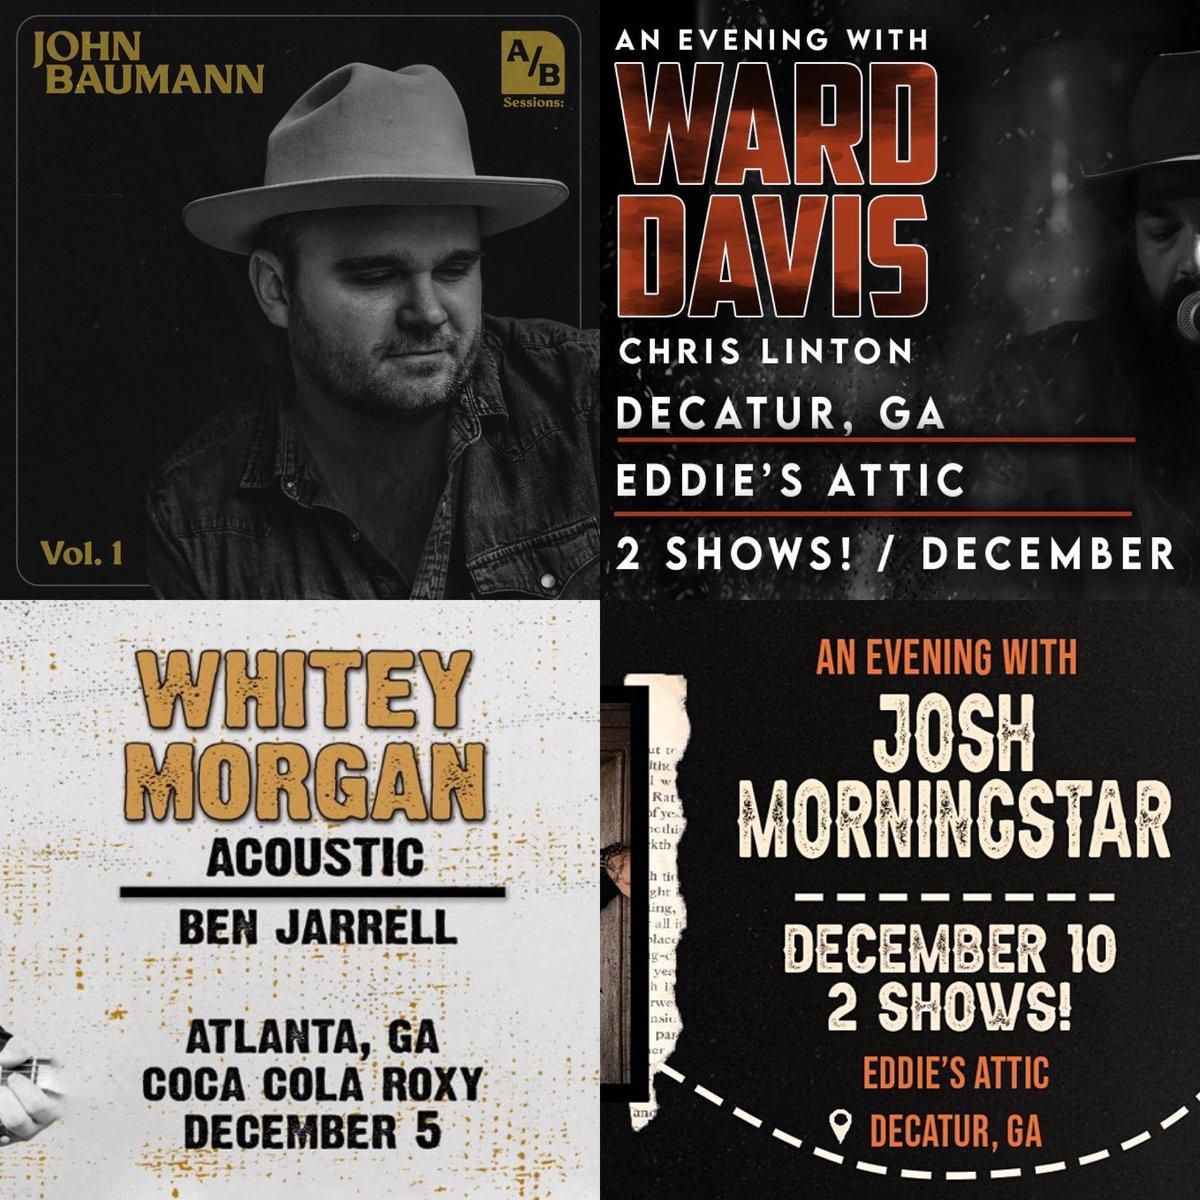 Got a BIG week ahead Atlanta...@John_Baumann_ going to kick it off Wed @GateCityBrewing Thurs @warddavismusic going to be @eddiesattic followed by @WhiteyMorgan on Fri @CocaColaRoxy The following week @joshmorningstar will be in town.